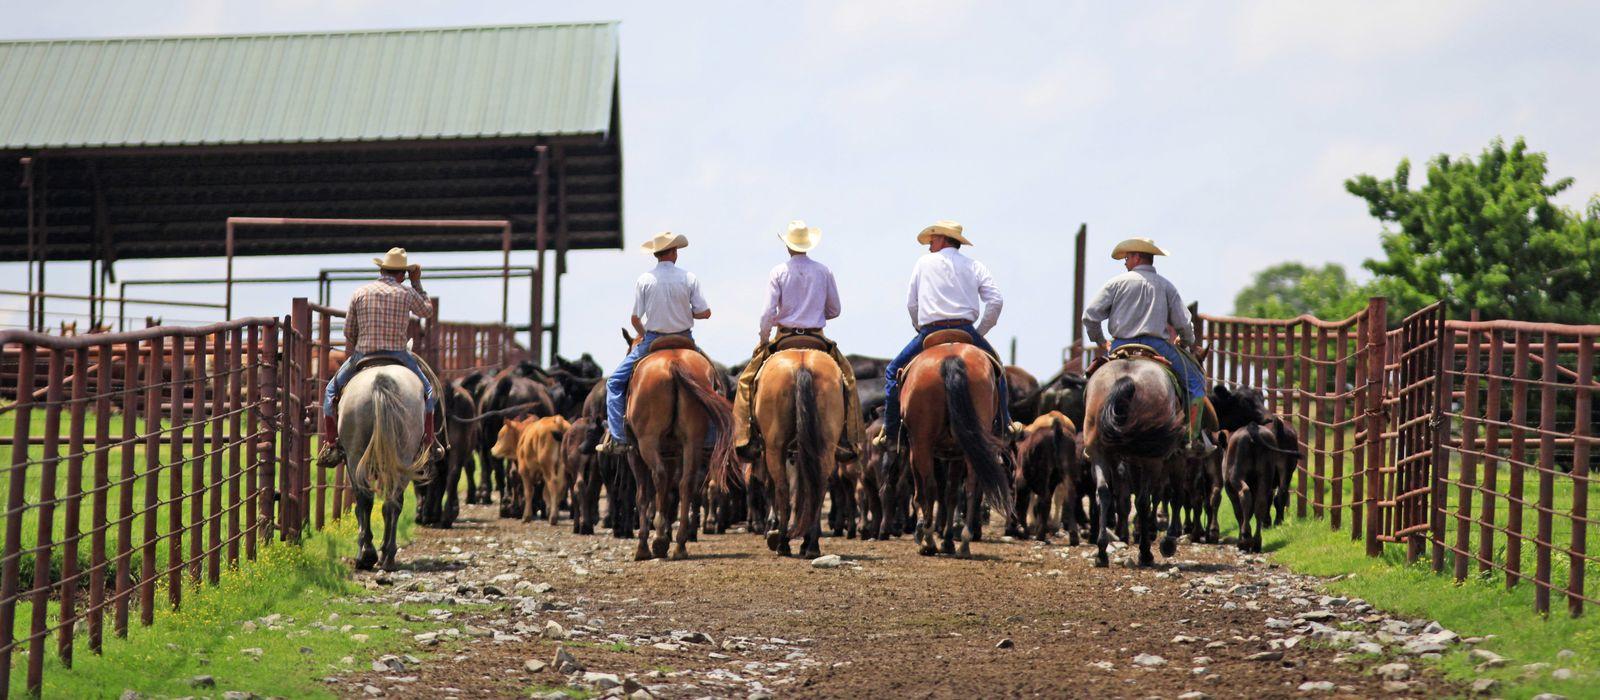 A Bar Ranch in Claremore, Oklahoma